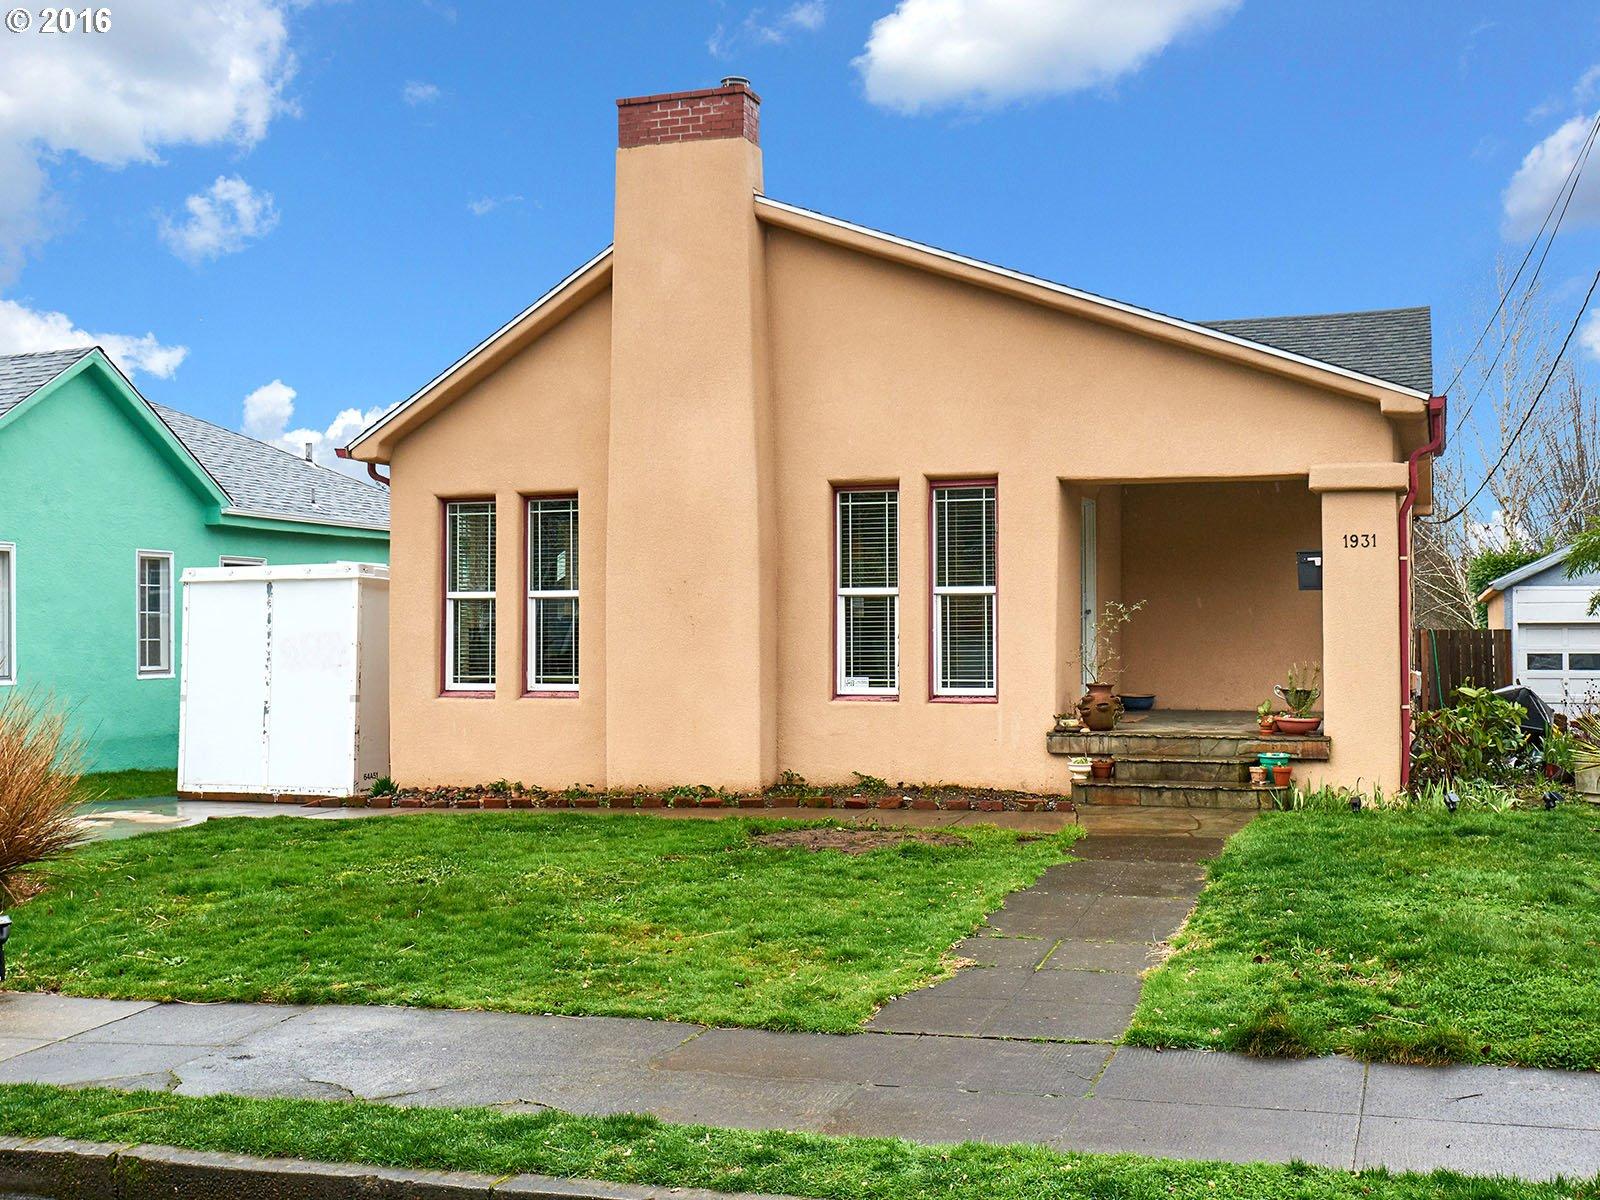 1931 SE 58TH AVE, Portland OR 97215